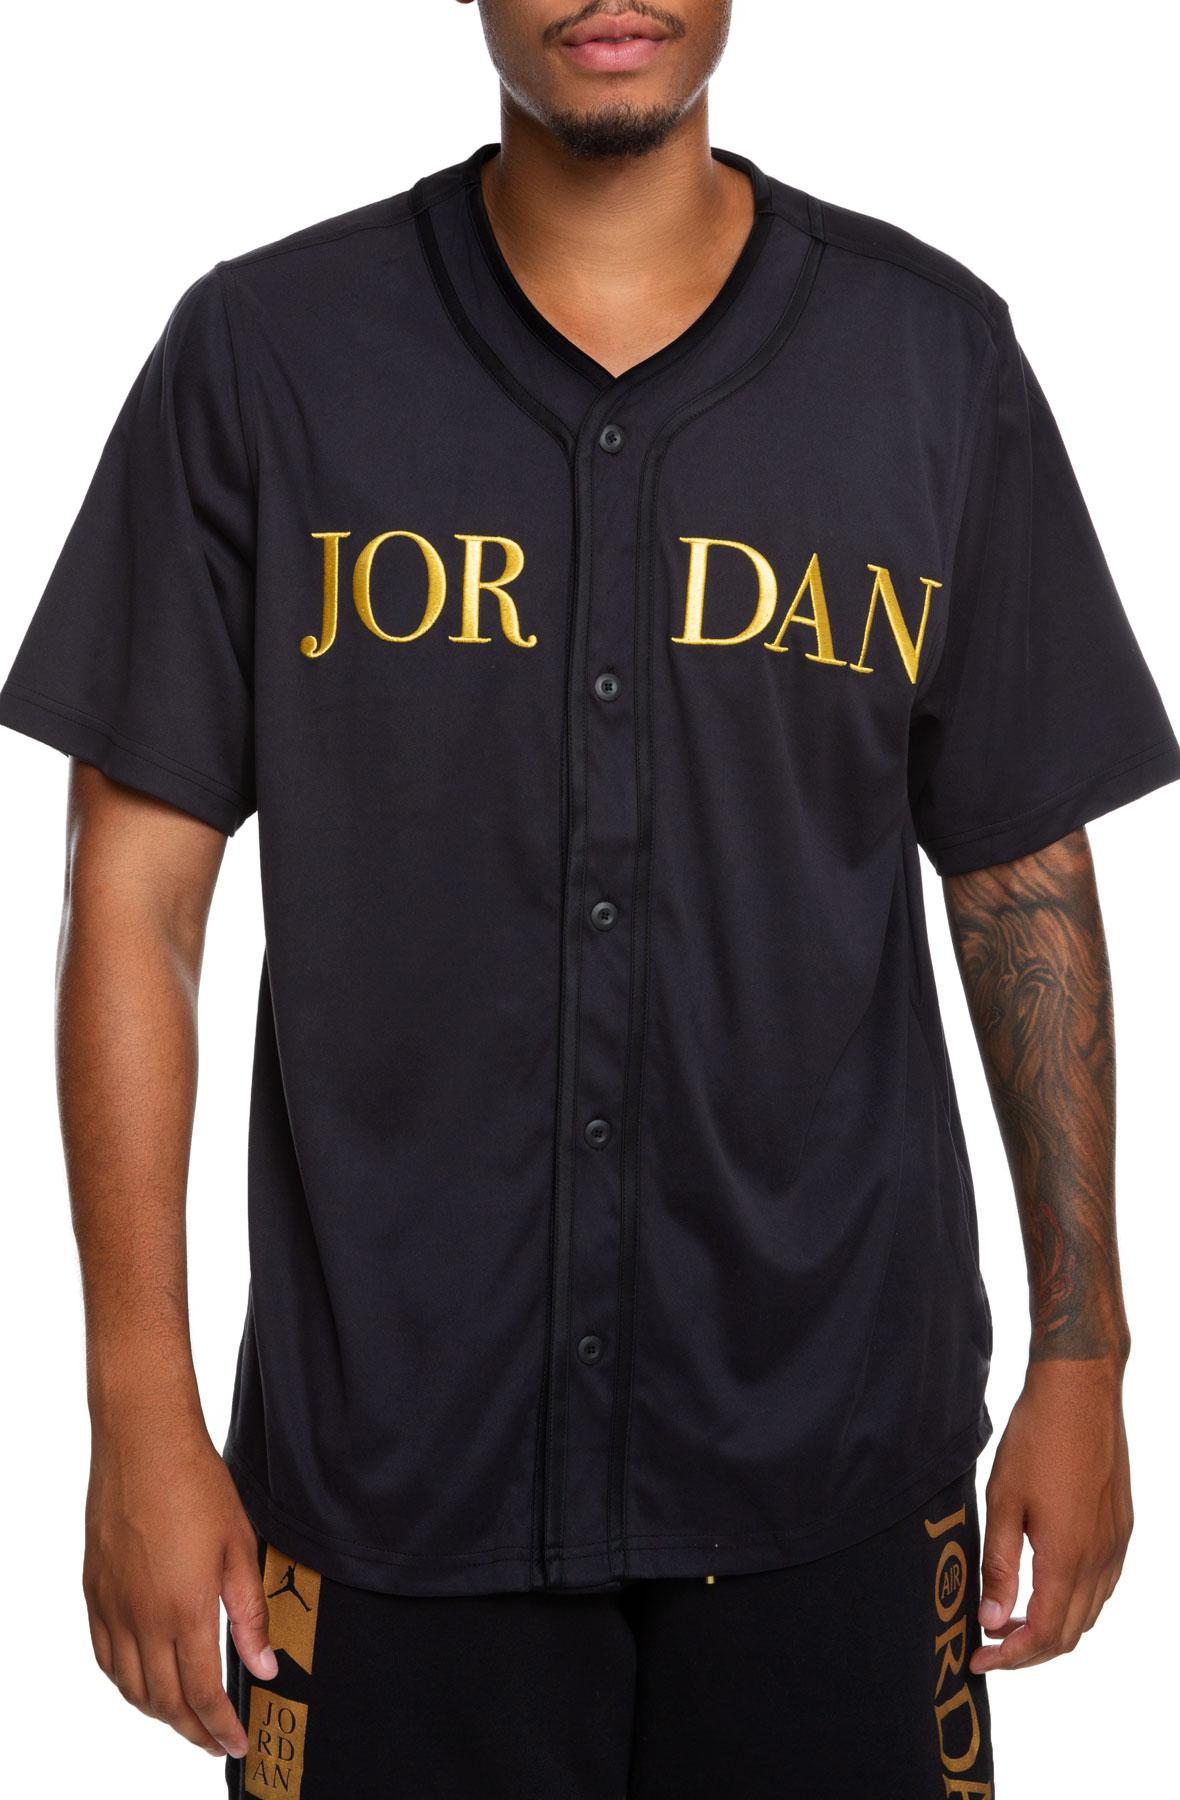 competitive price 5088d cb5f7 MJ Remastered Baseball Jersey Black/Metallic Gold